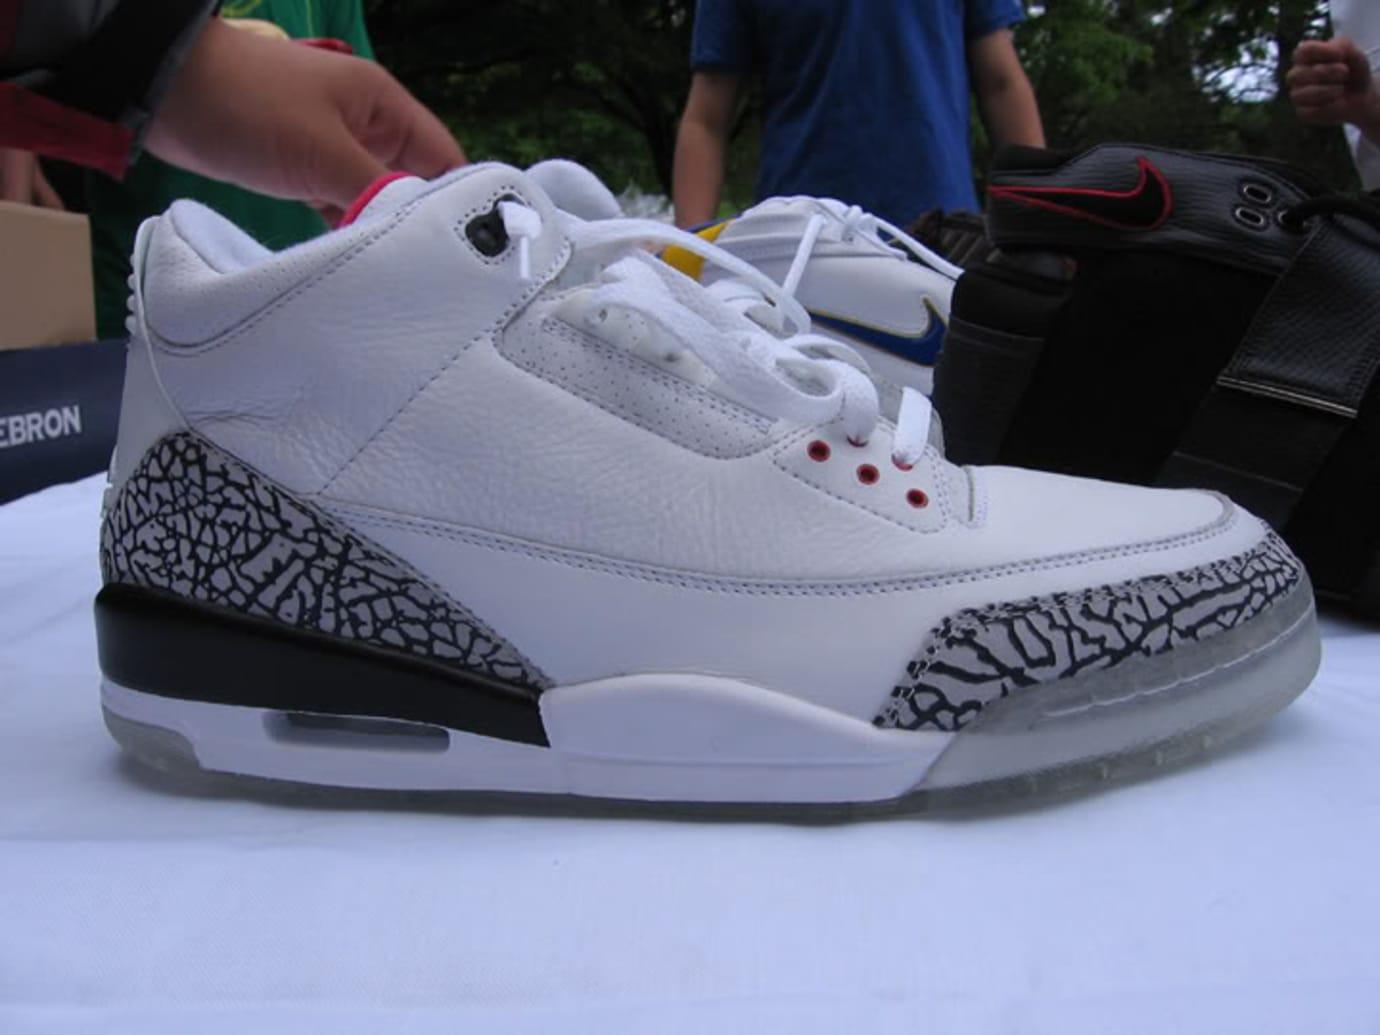 Air Jordan 3 'Clear Sole' Sample